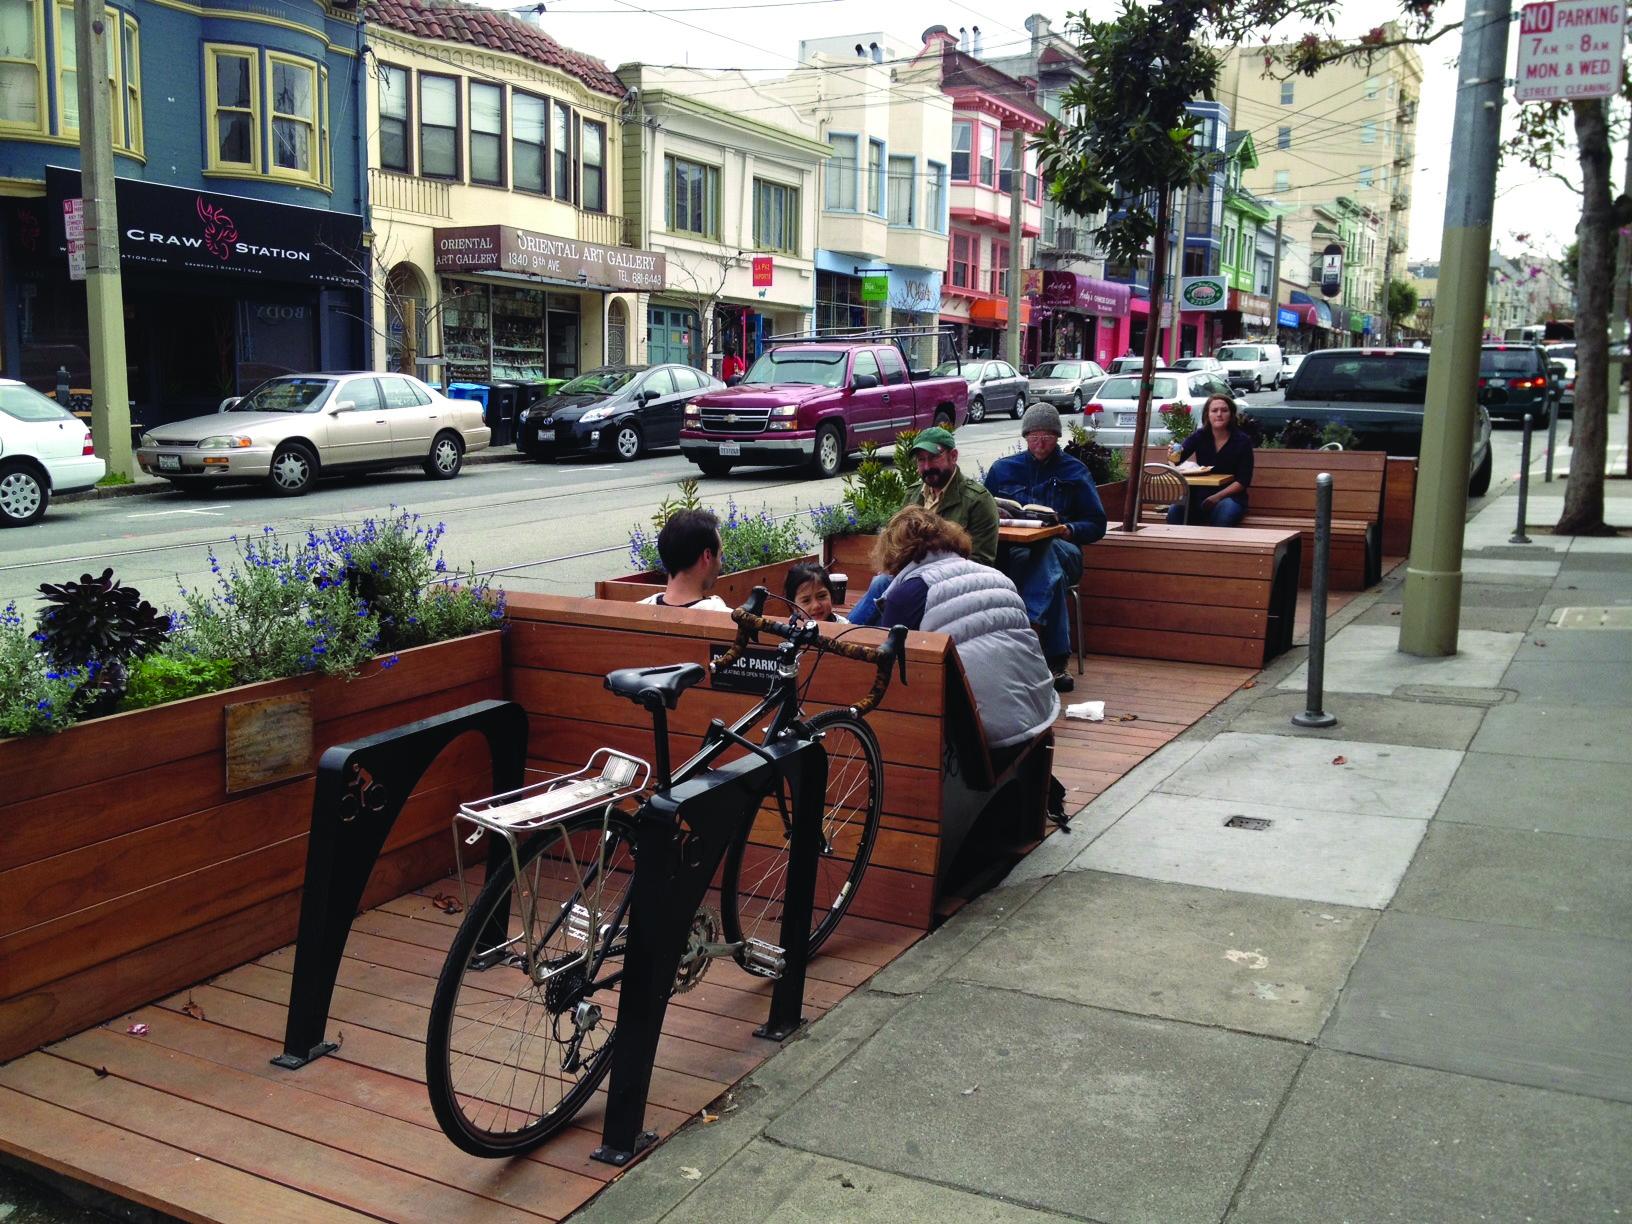 Inner Sunset District parklet, San Francisco, CA